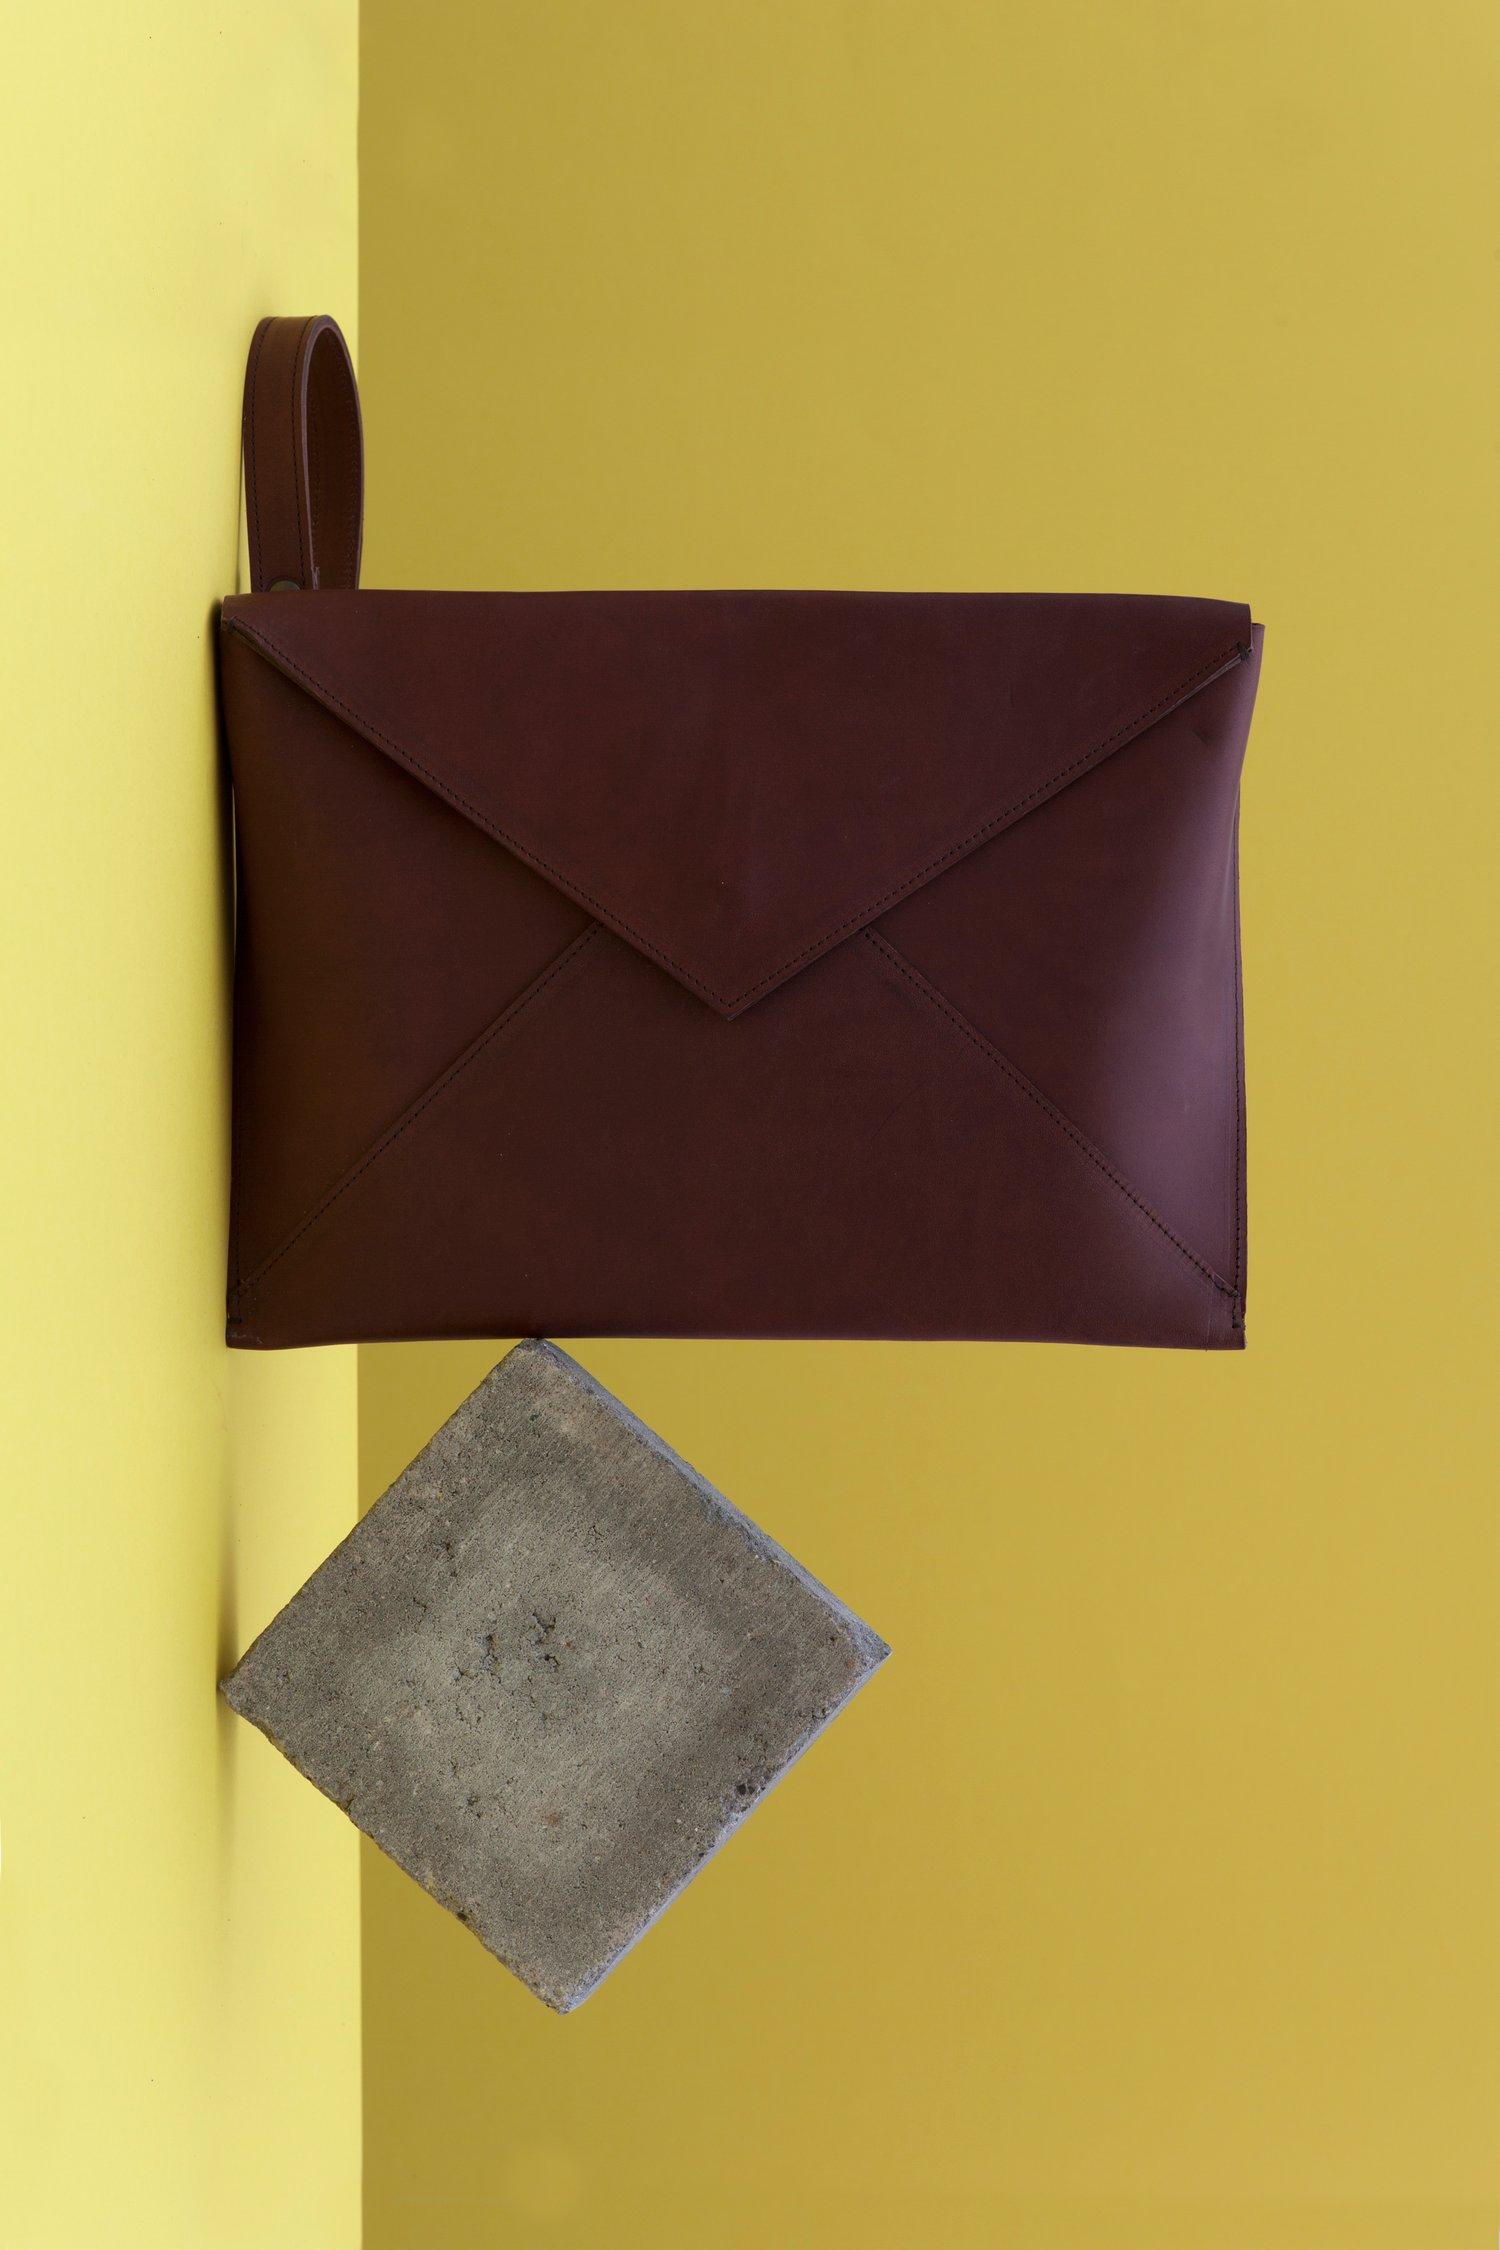 Image of Enveloppe Noce